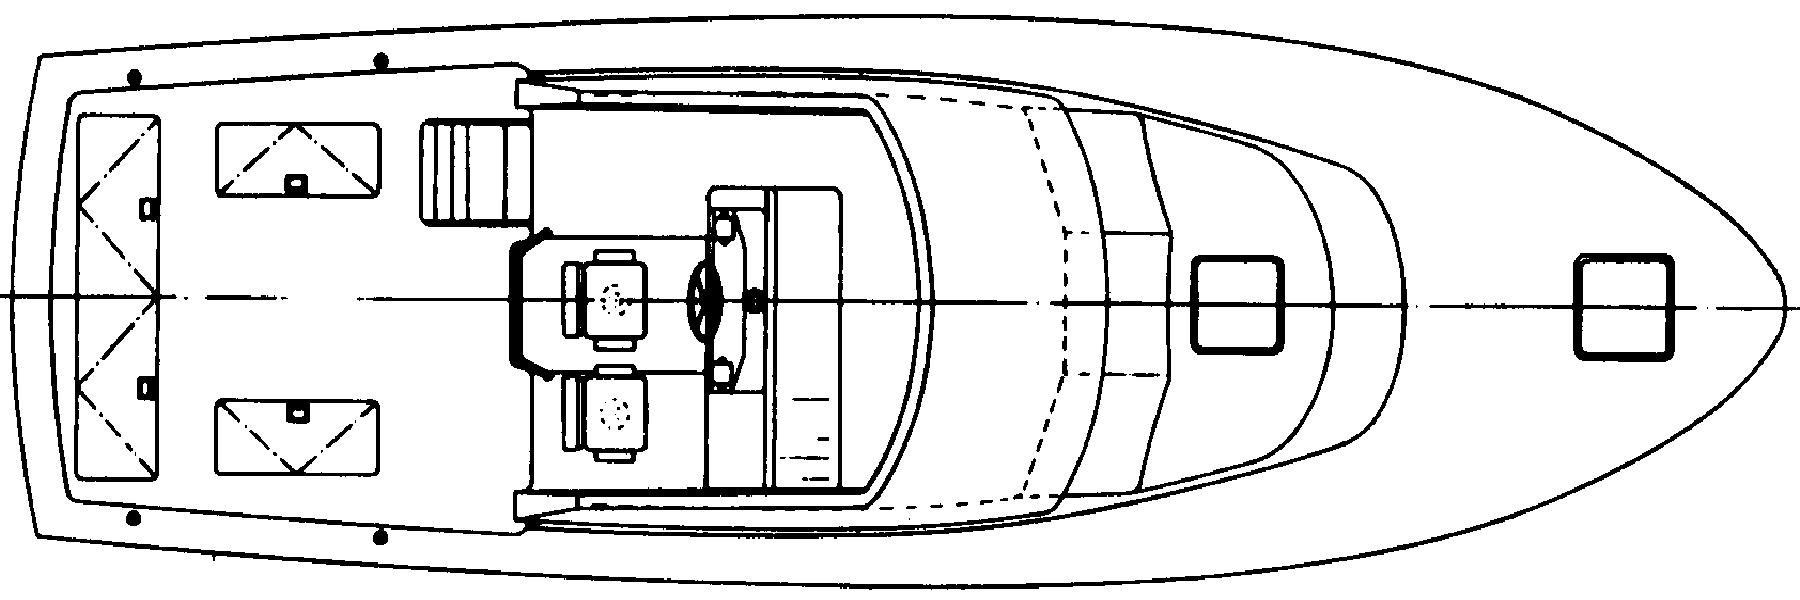 36 Flybridge Floor Plan 2